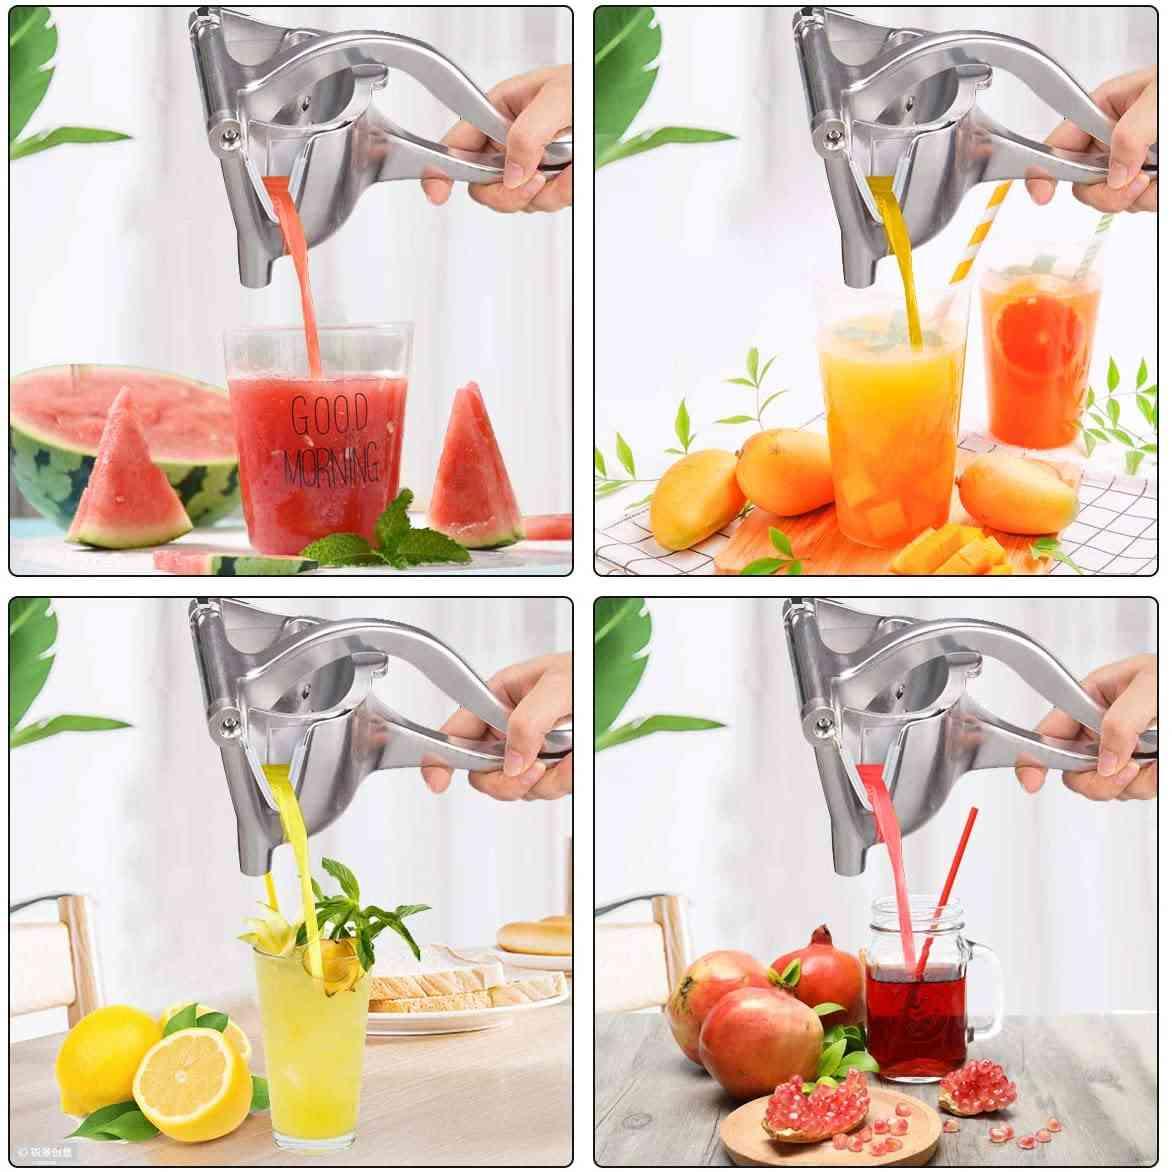 Manual Juice Squeezer, Hand Pressure Juicer Kitchen Fruit Tool